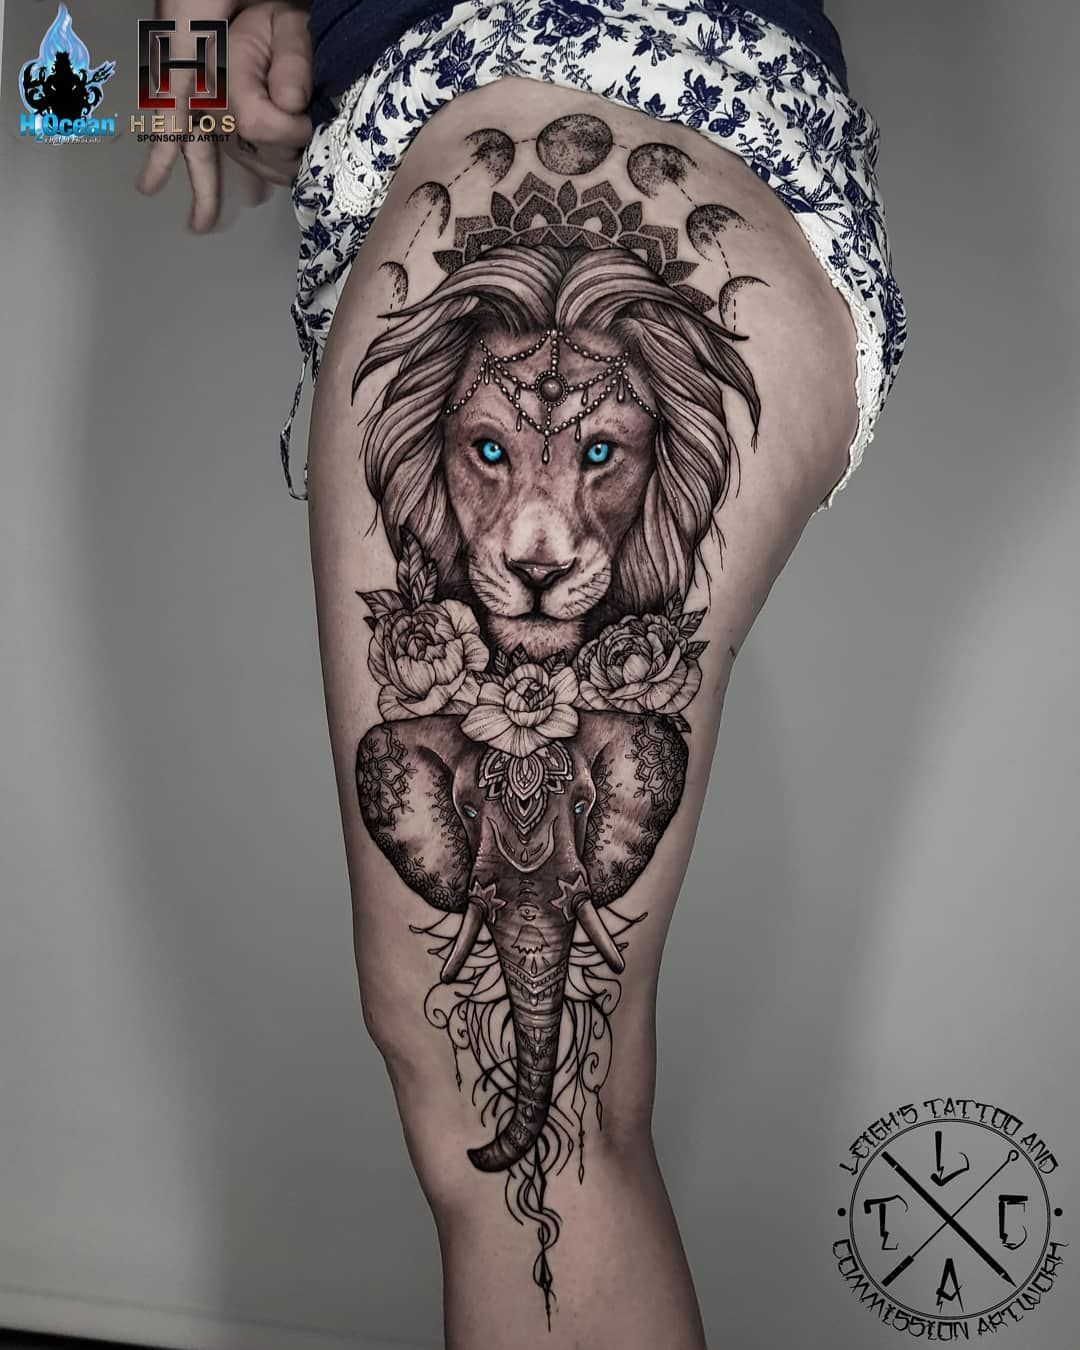 Leighstca Op Instagram Lion And Elephant Thigh Piece Insta Leigh Tattoos Fb Leighstca For All B In 2020 Lion Tattoo Sleeves Elephant Thigh Tattoo Elephant Tattoos